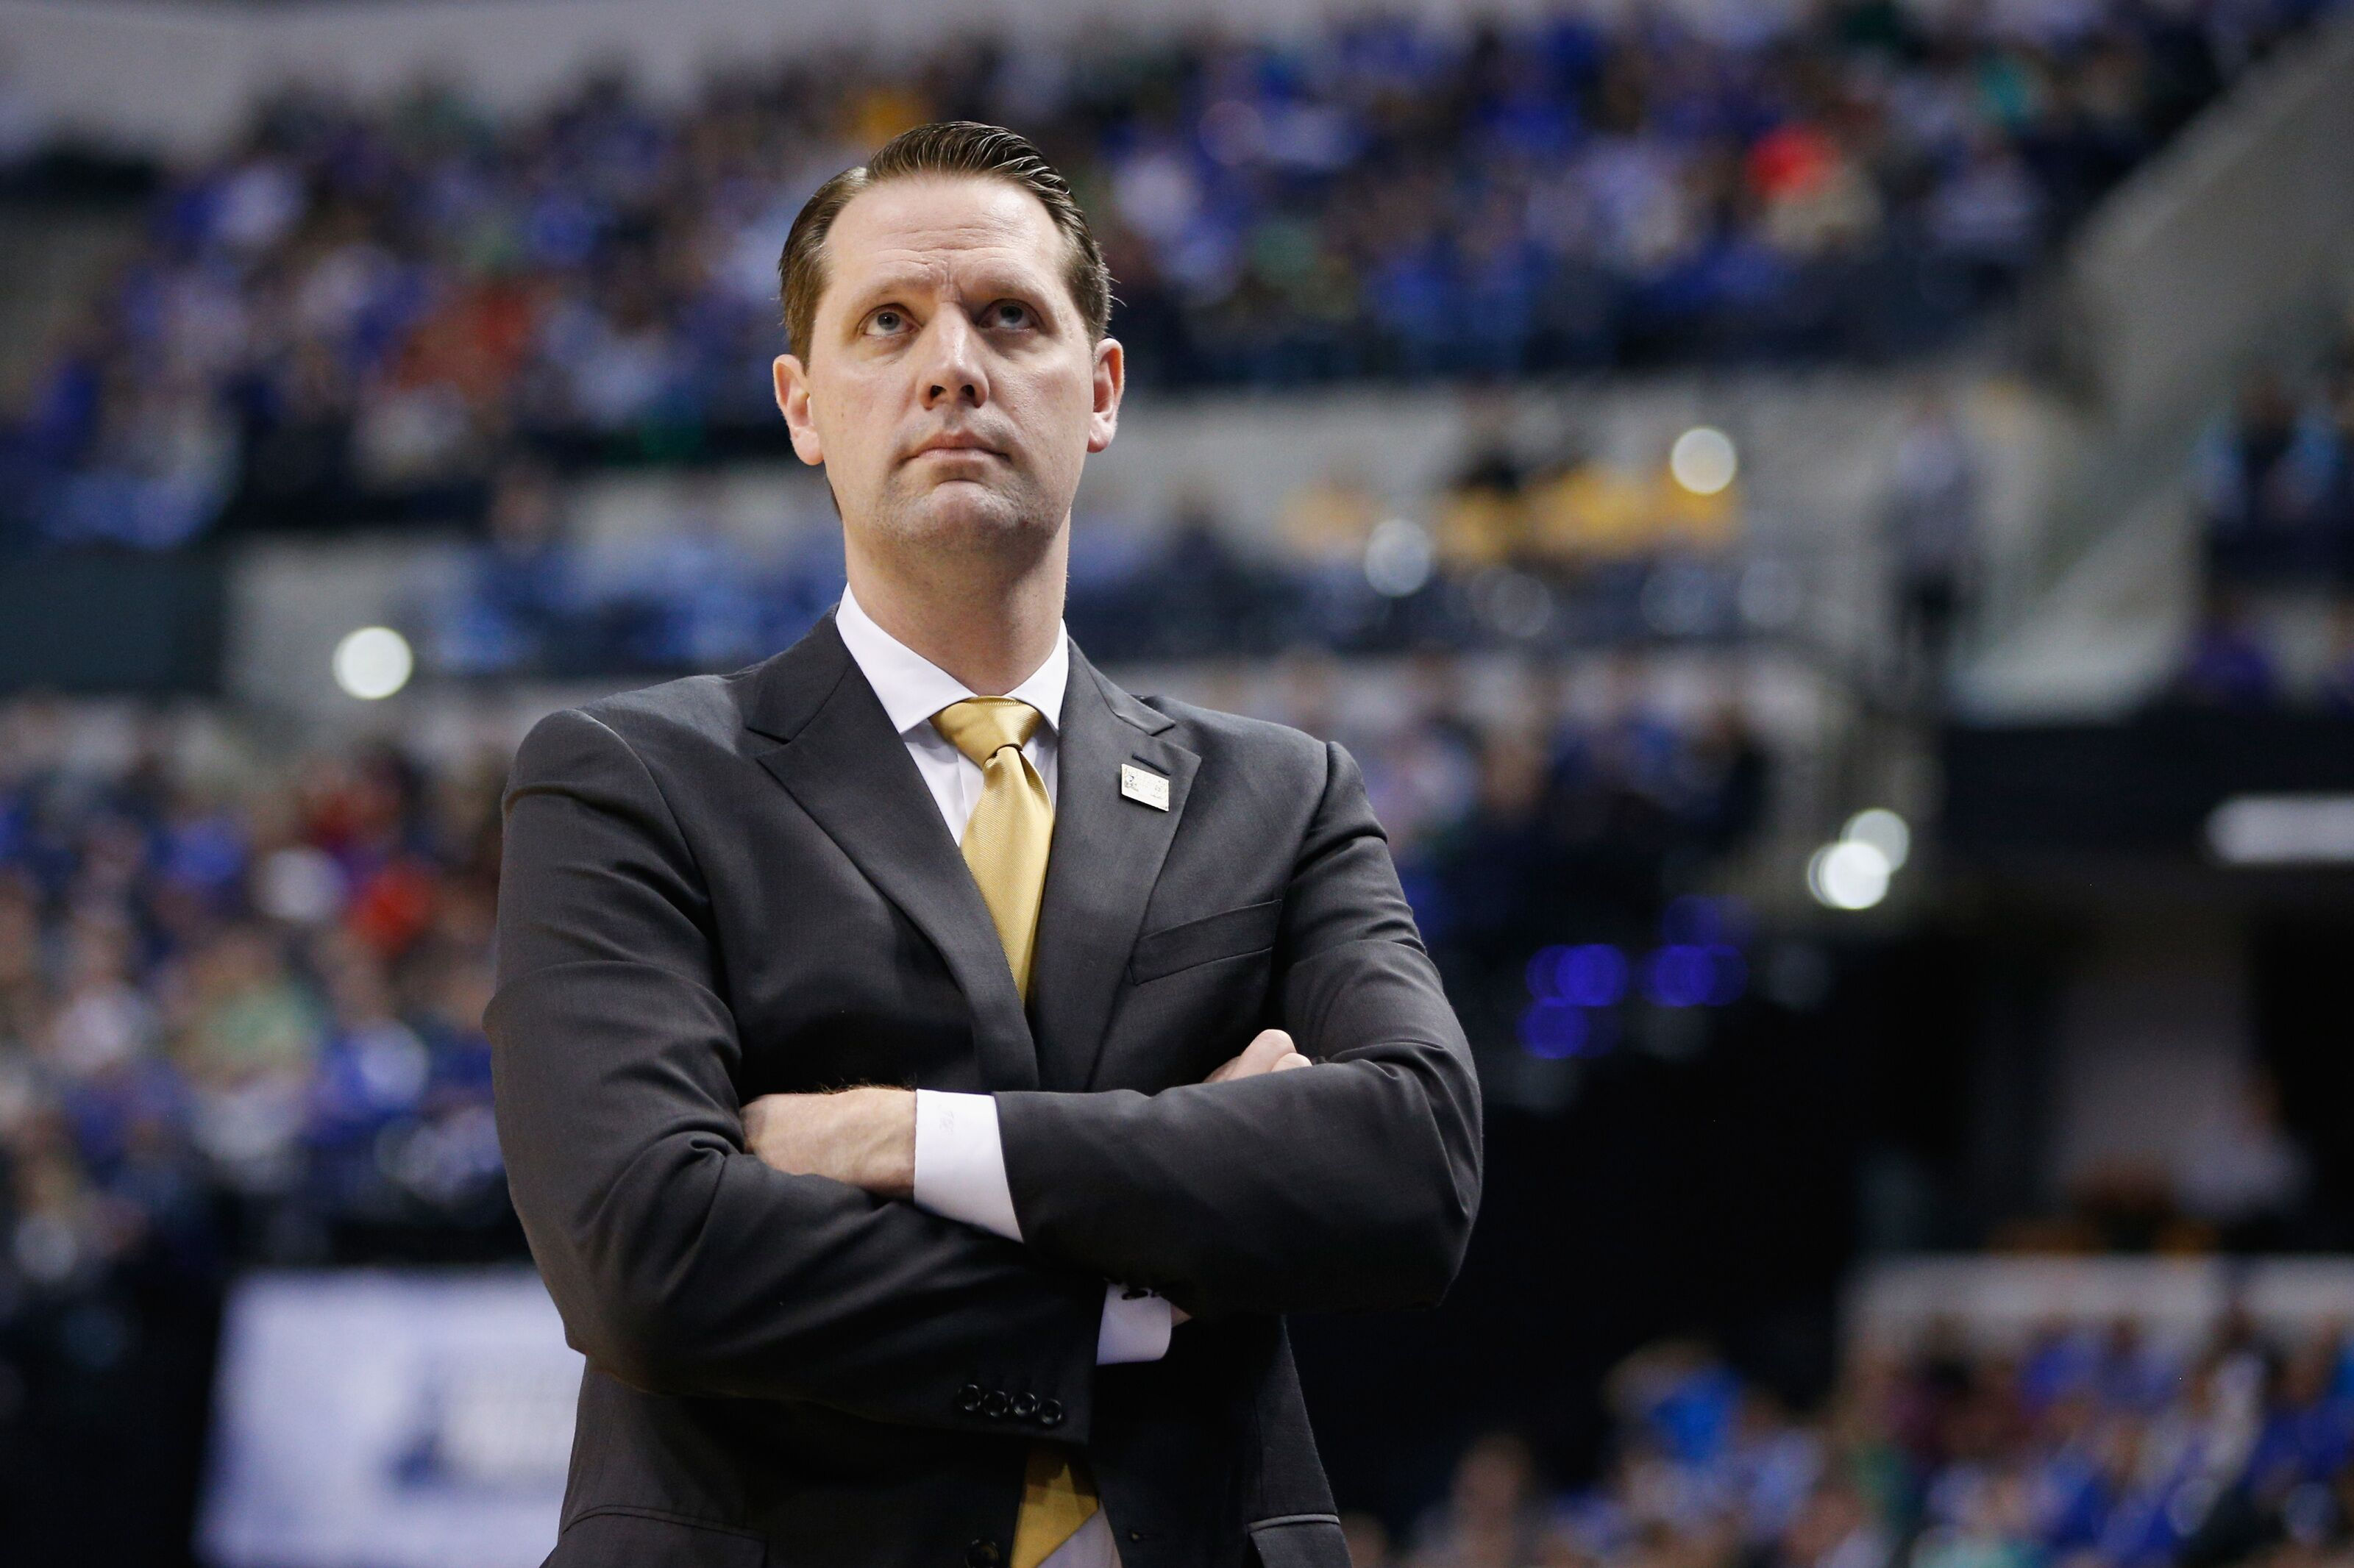 Cincinnati Basketball: Bearcats will remain AAC contenders in 2019-20